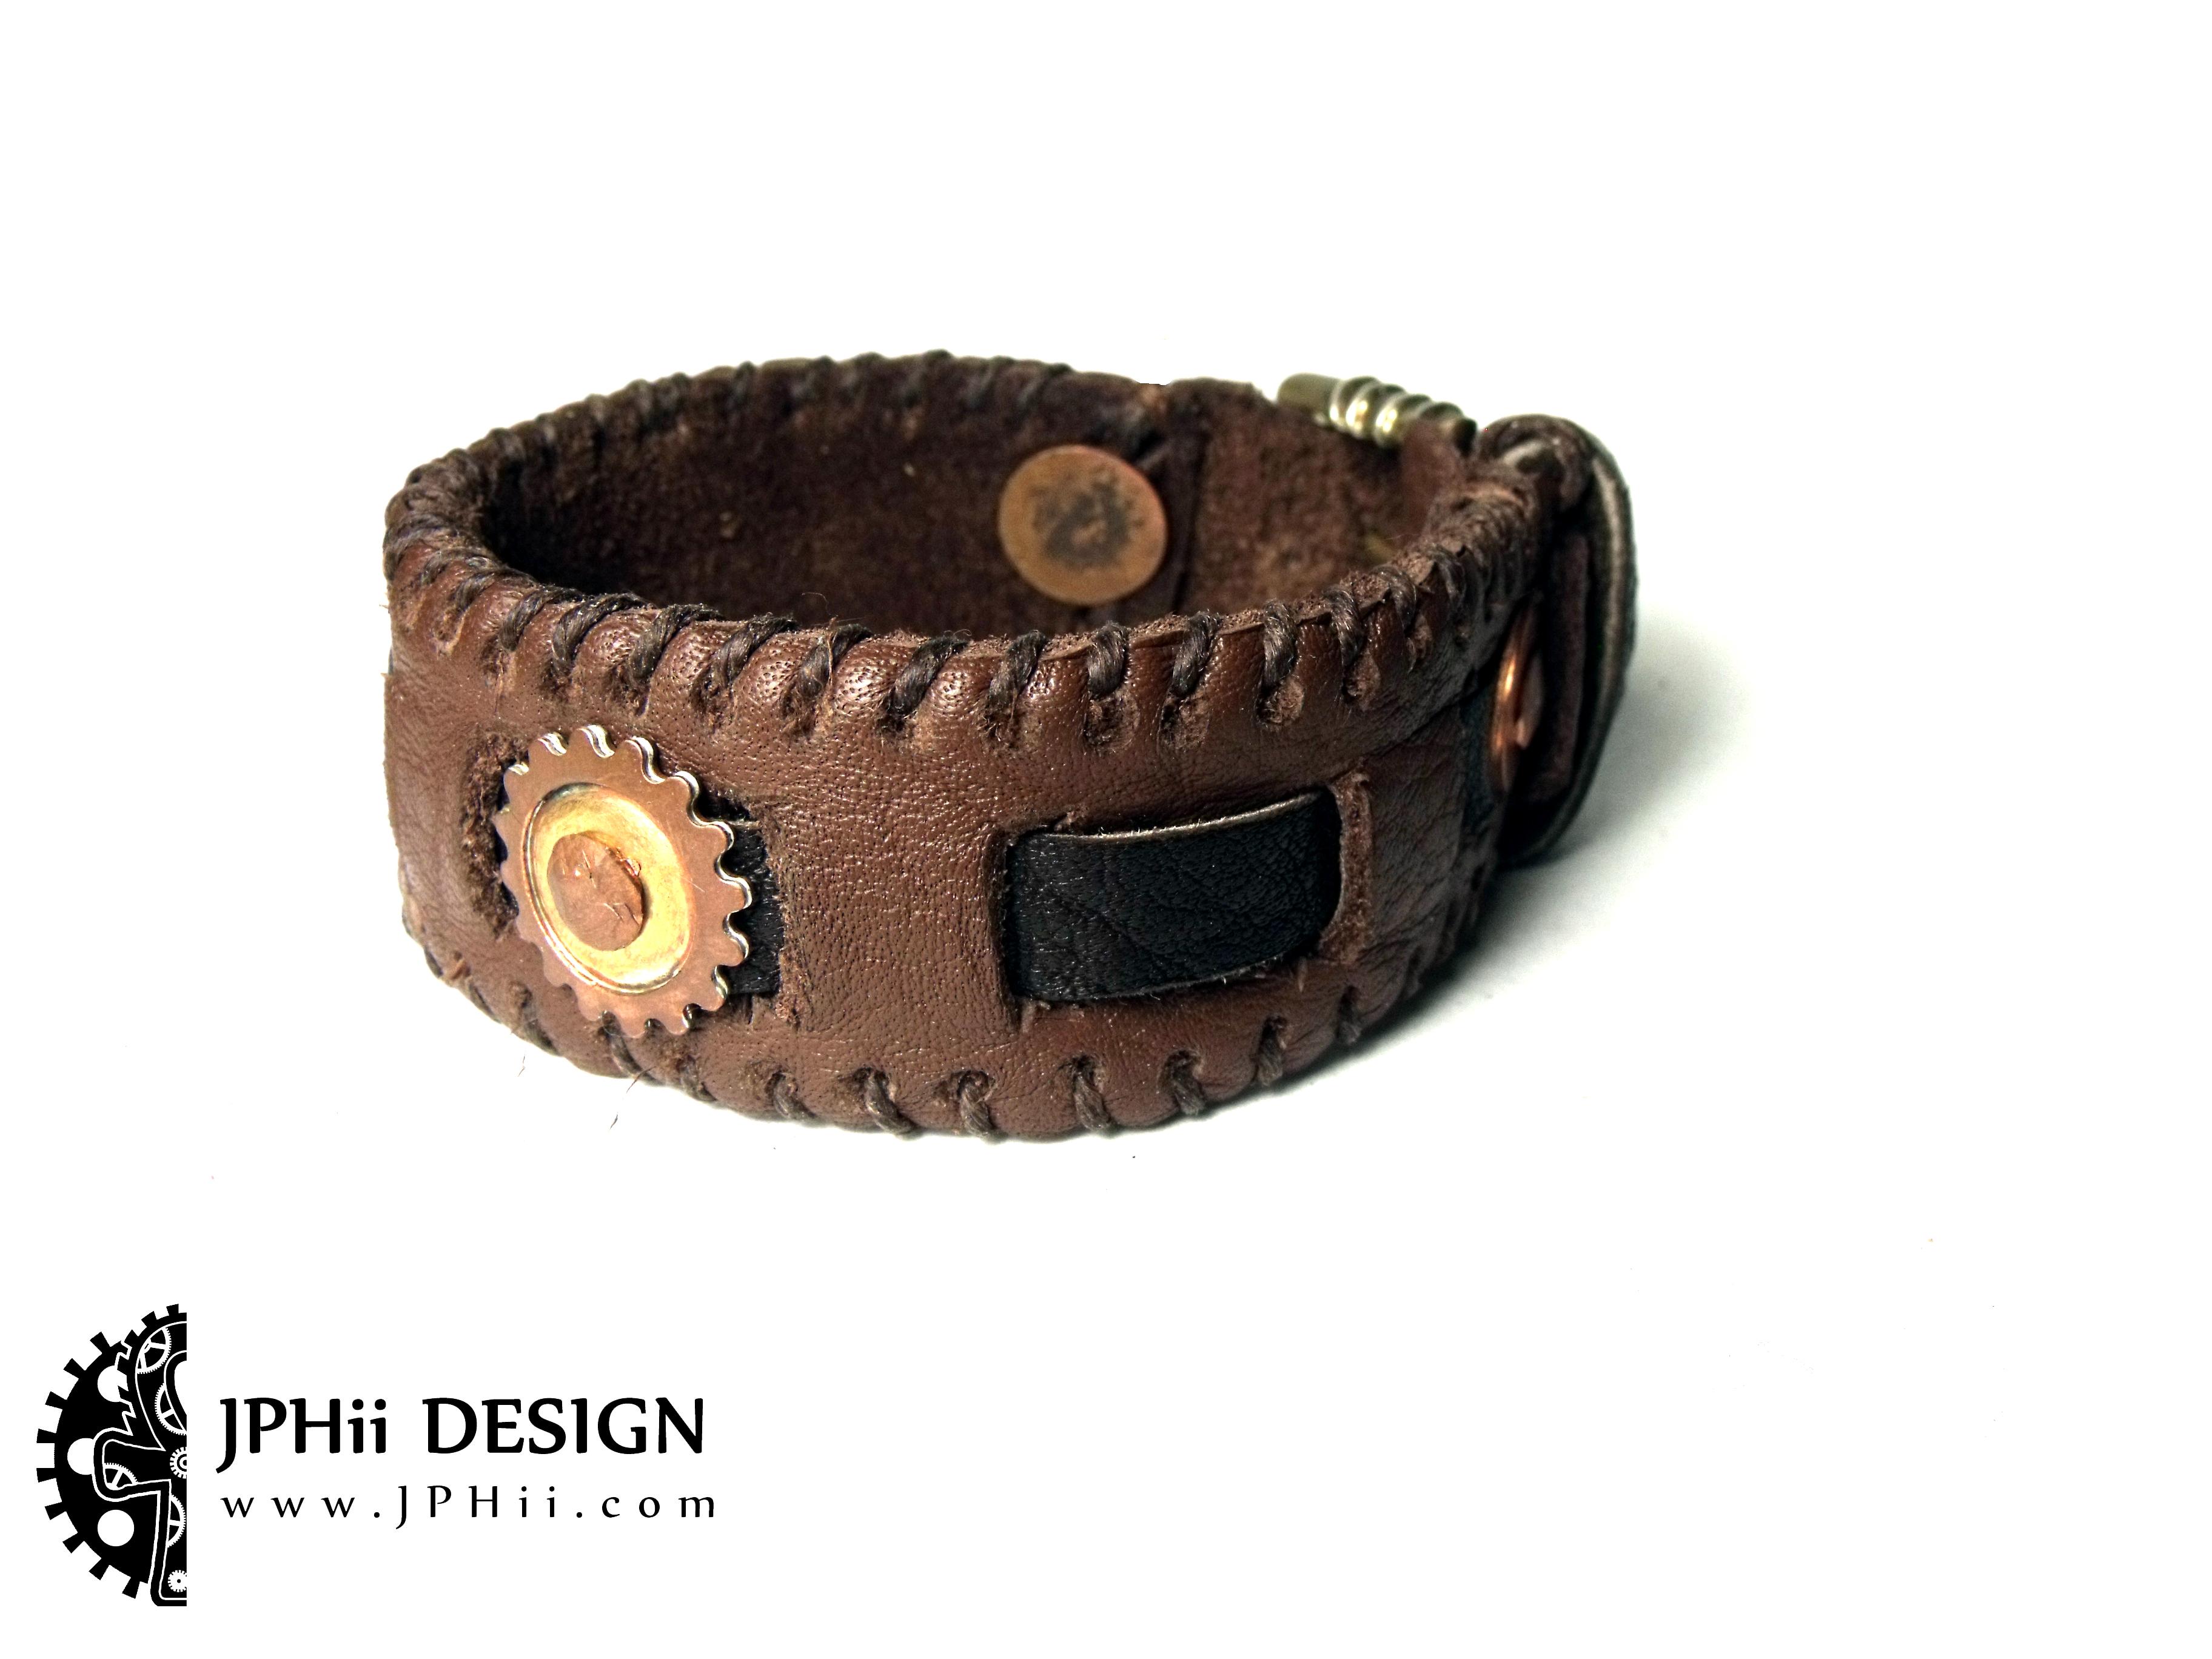 riveted_woven_leather_bracelet_bracelets_and_wristbands_3.jpg